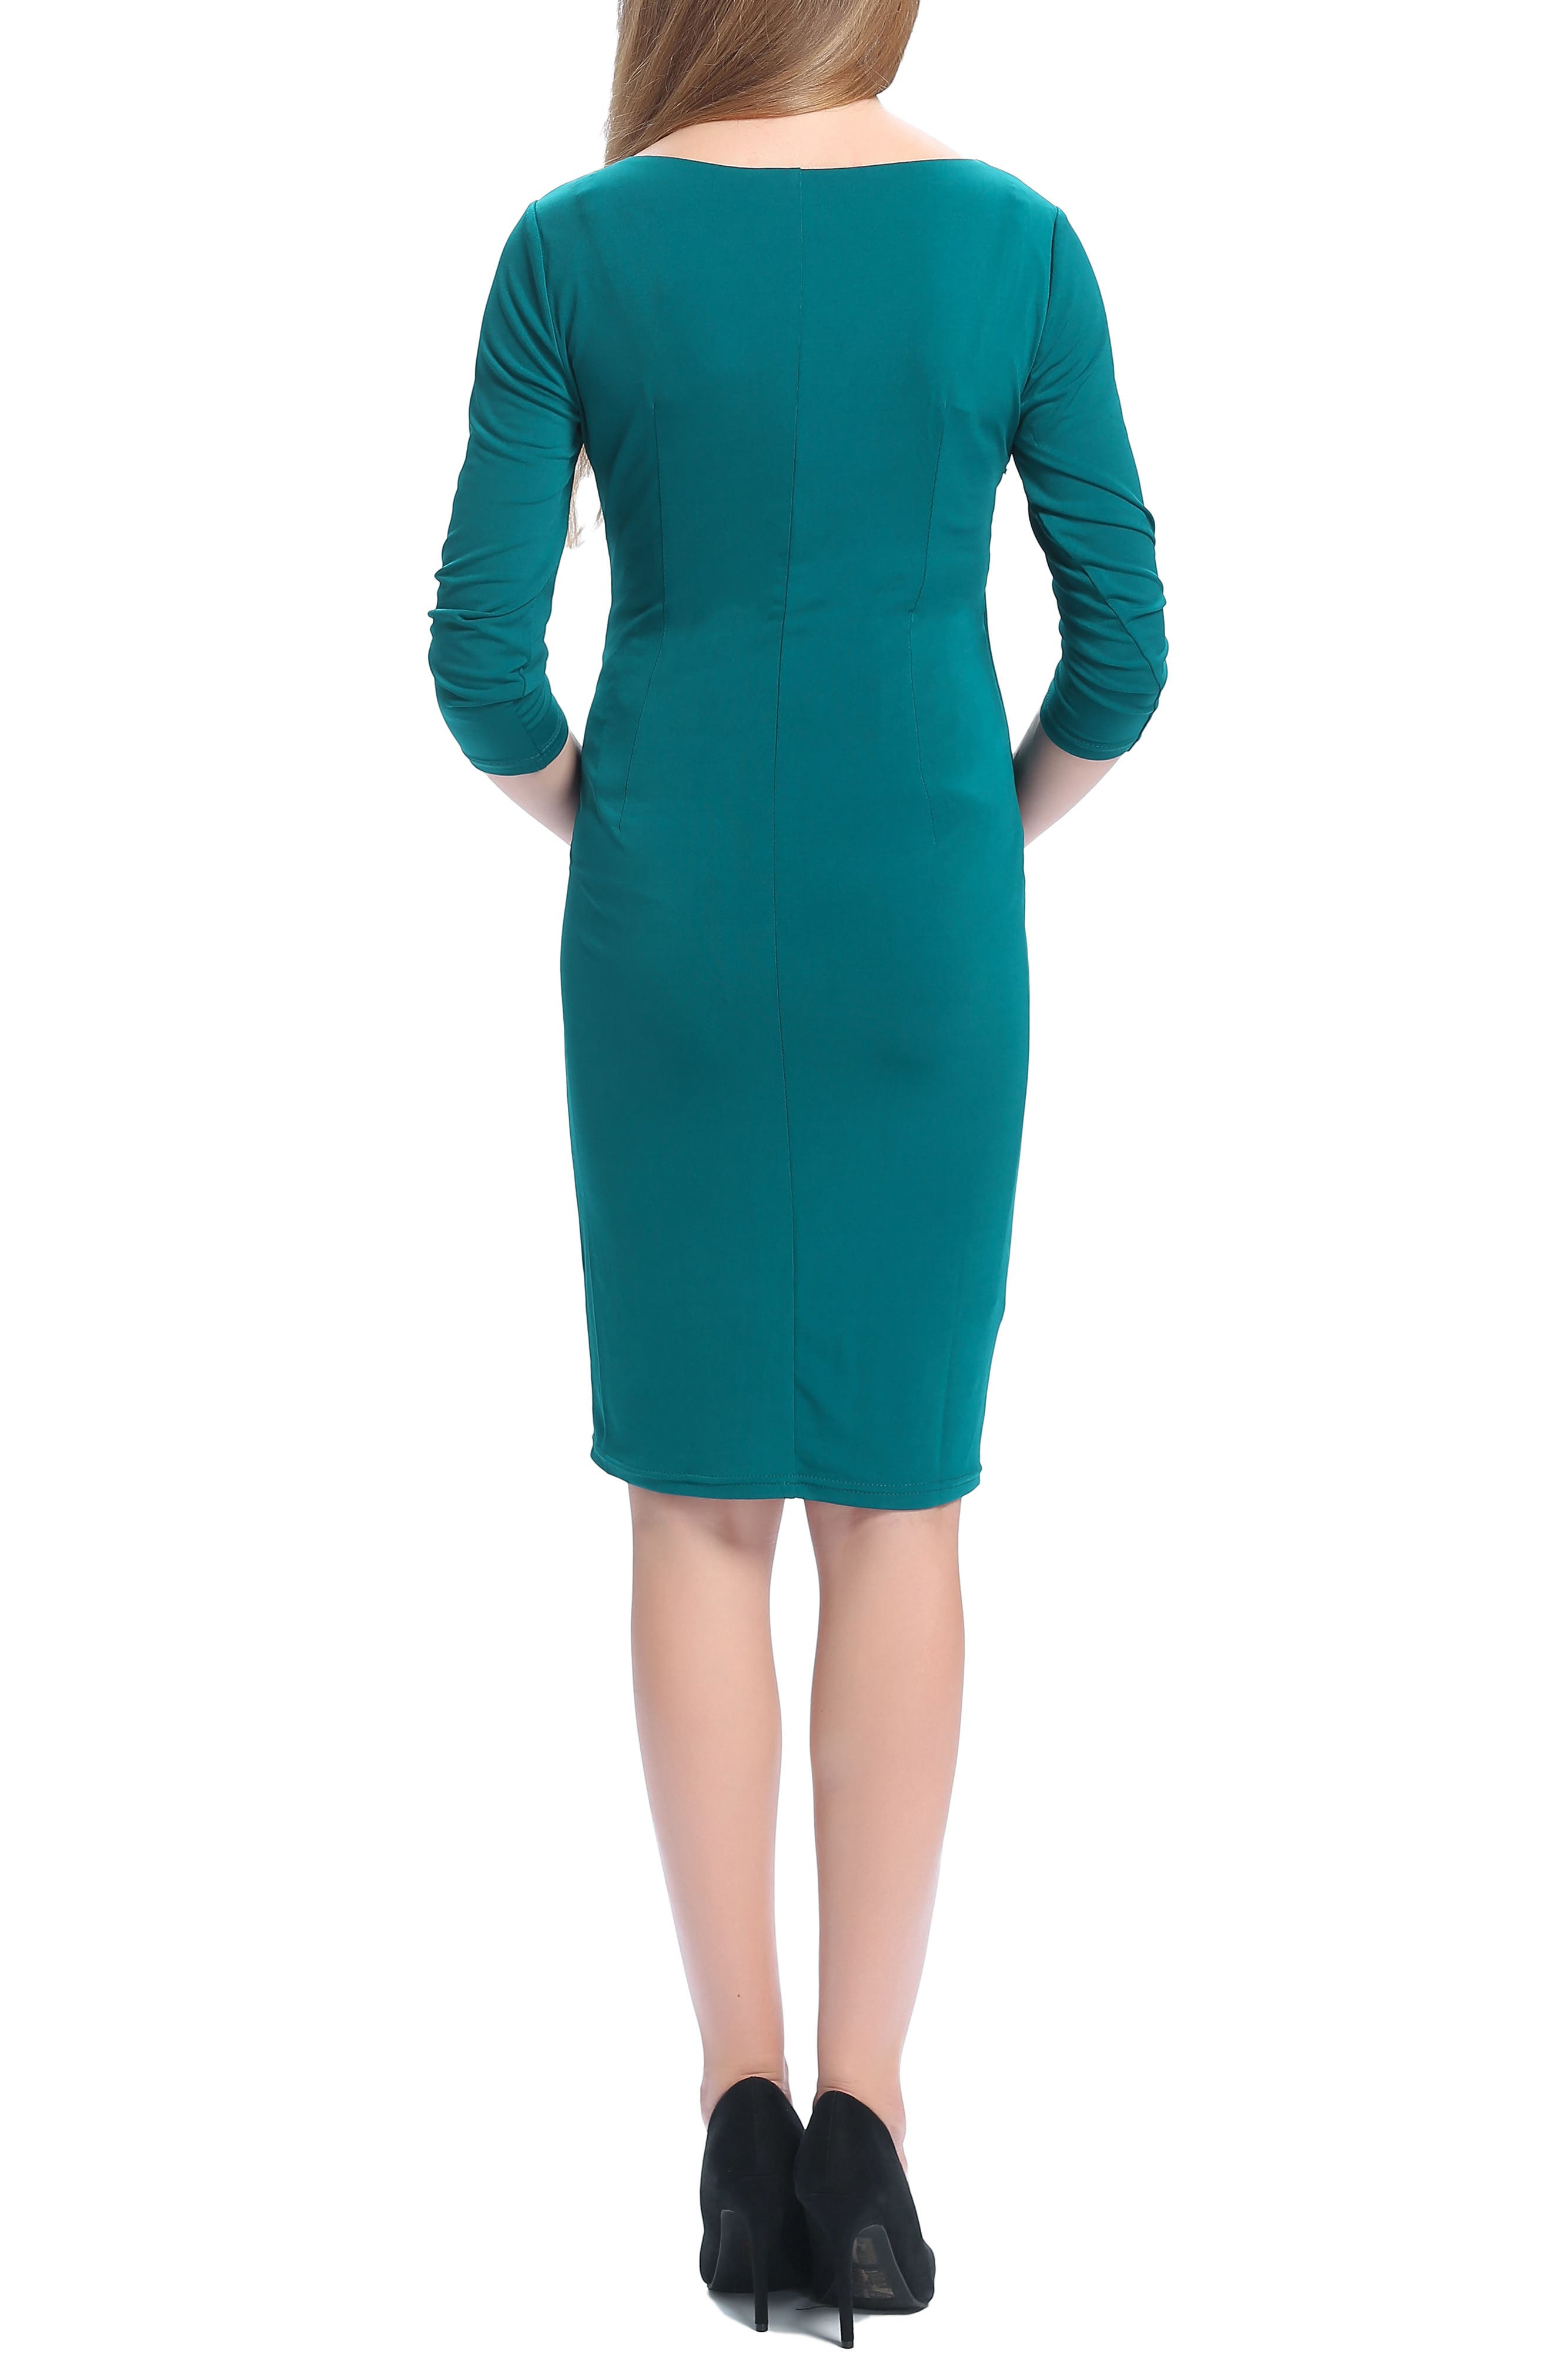 Teagan Body-Con Maternity Dress,                             Alternate thumbnail 2, color,                             TEAL